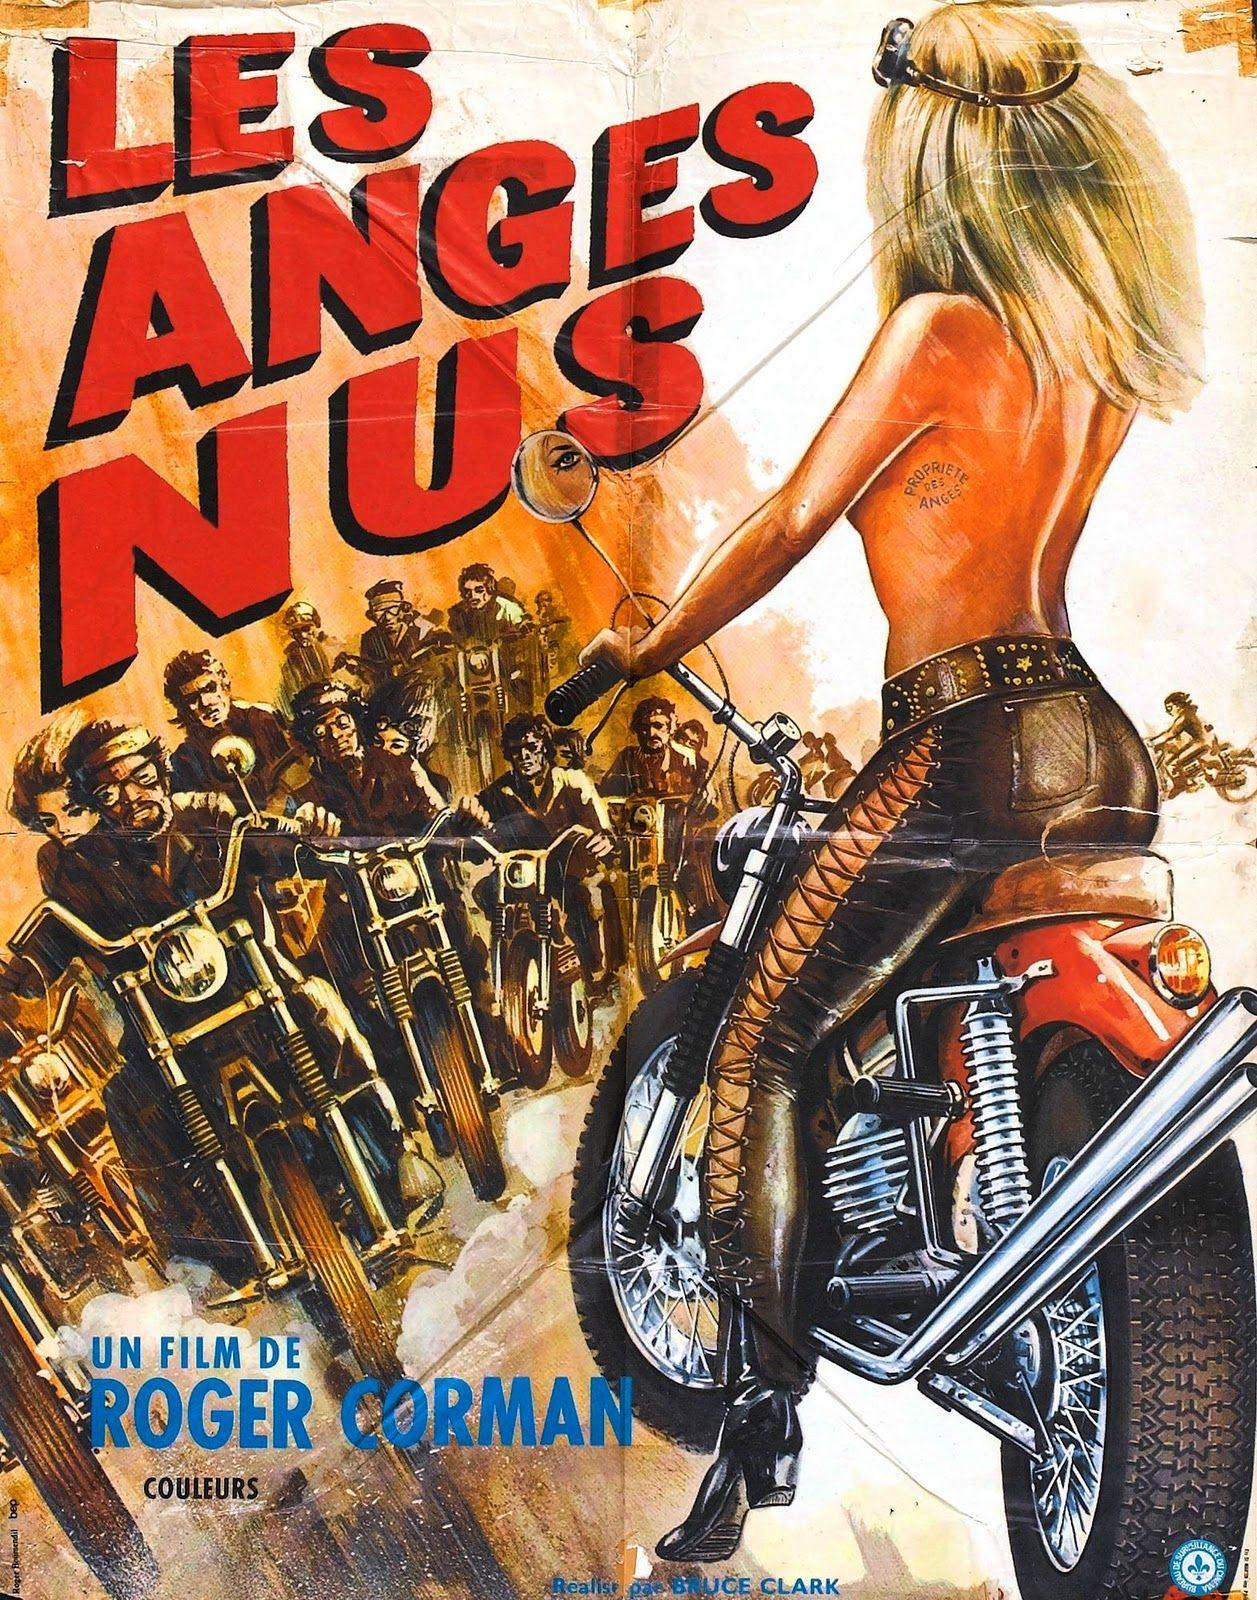 MOTORCYCLE 74: Biker movie poster - Naked Angels - Roger Corman